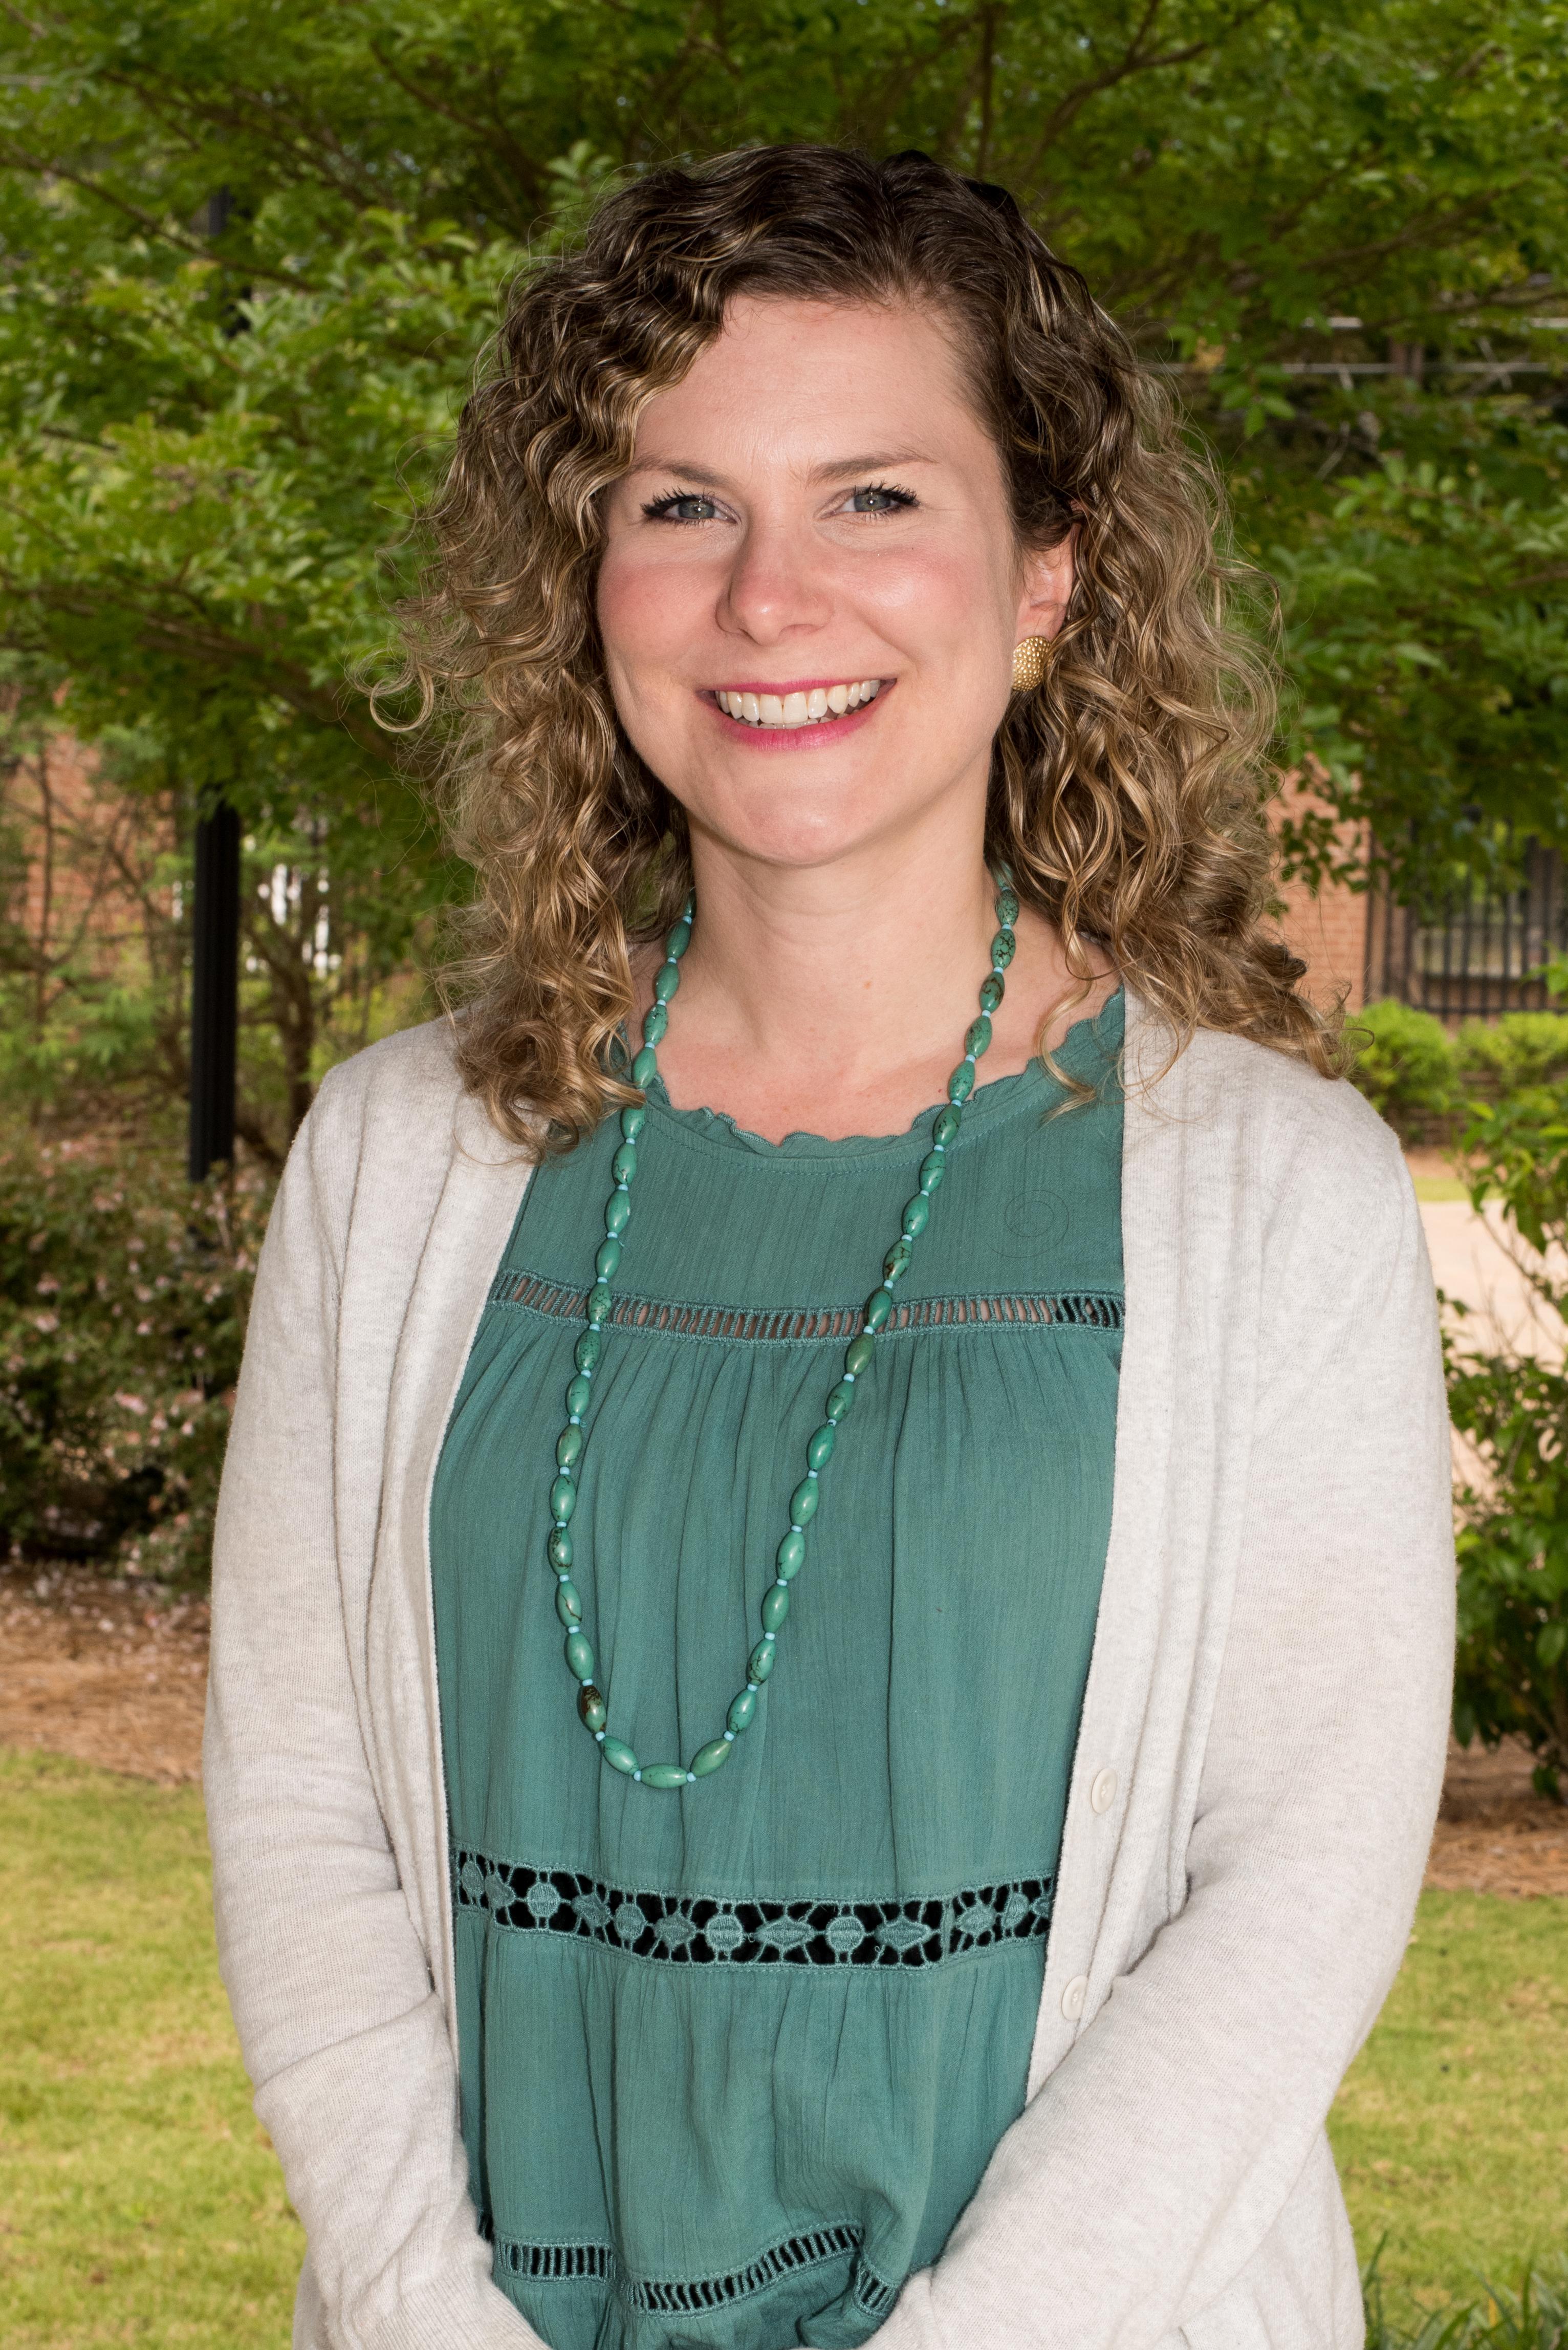 Laura Beth Peterson, MS, LPC